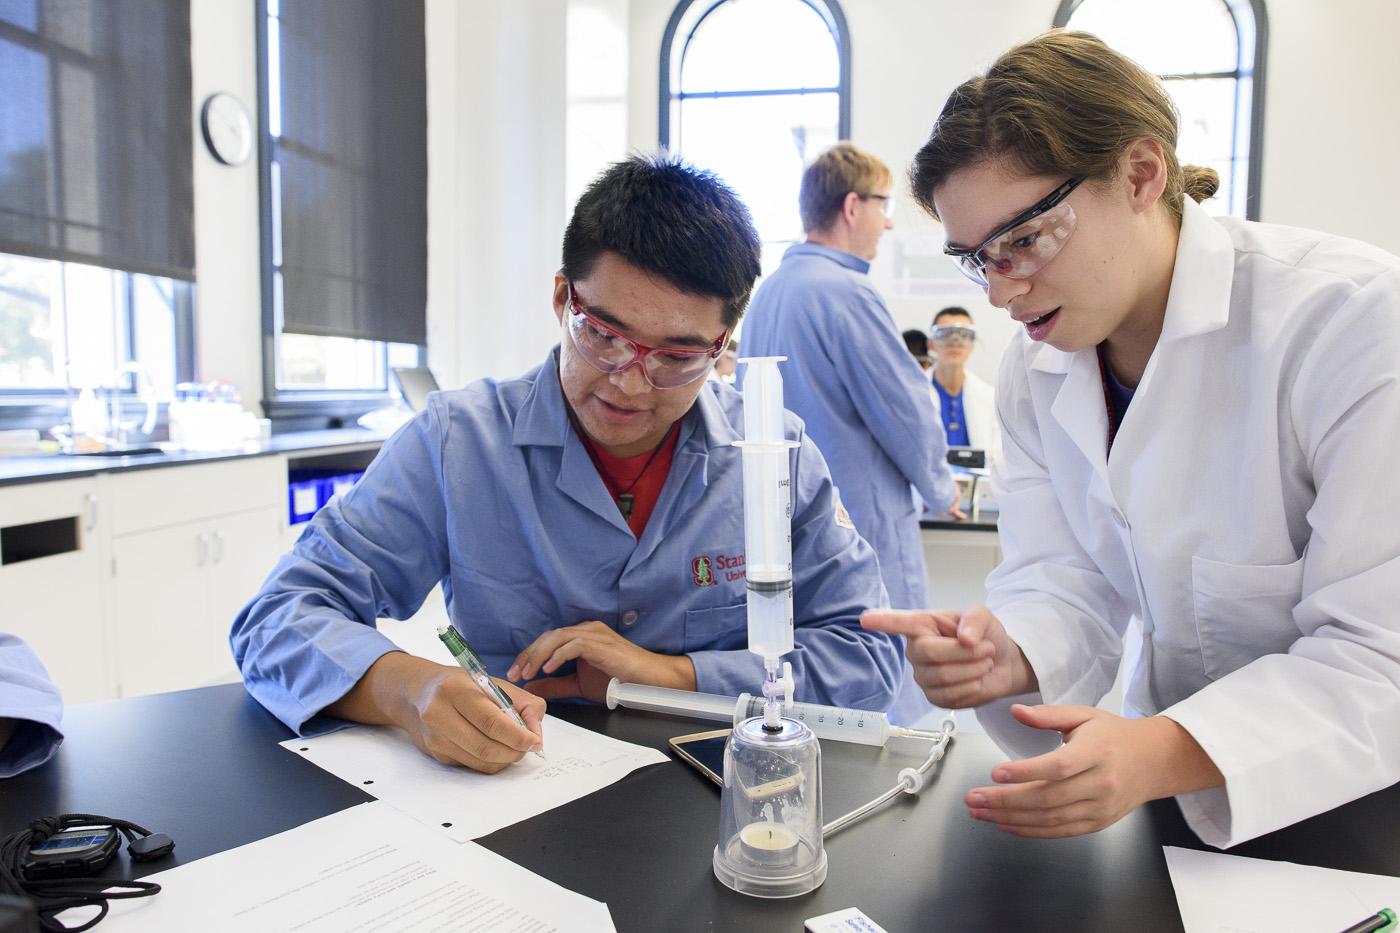 Leland Scholars Ely Jay Nez and Lizbeth Gomez observe changes in a lit candle after introducing nitrogen into a sealed jar.